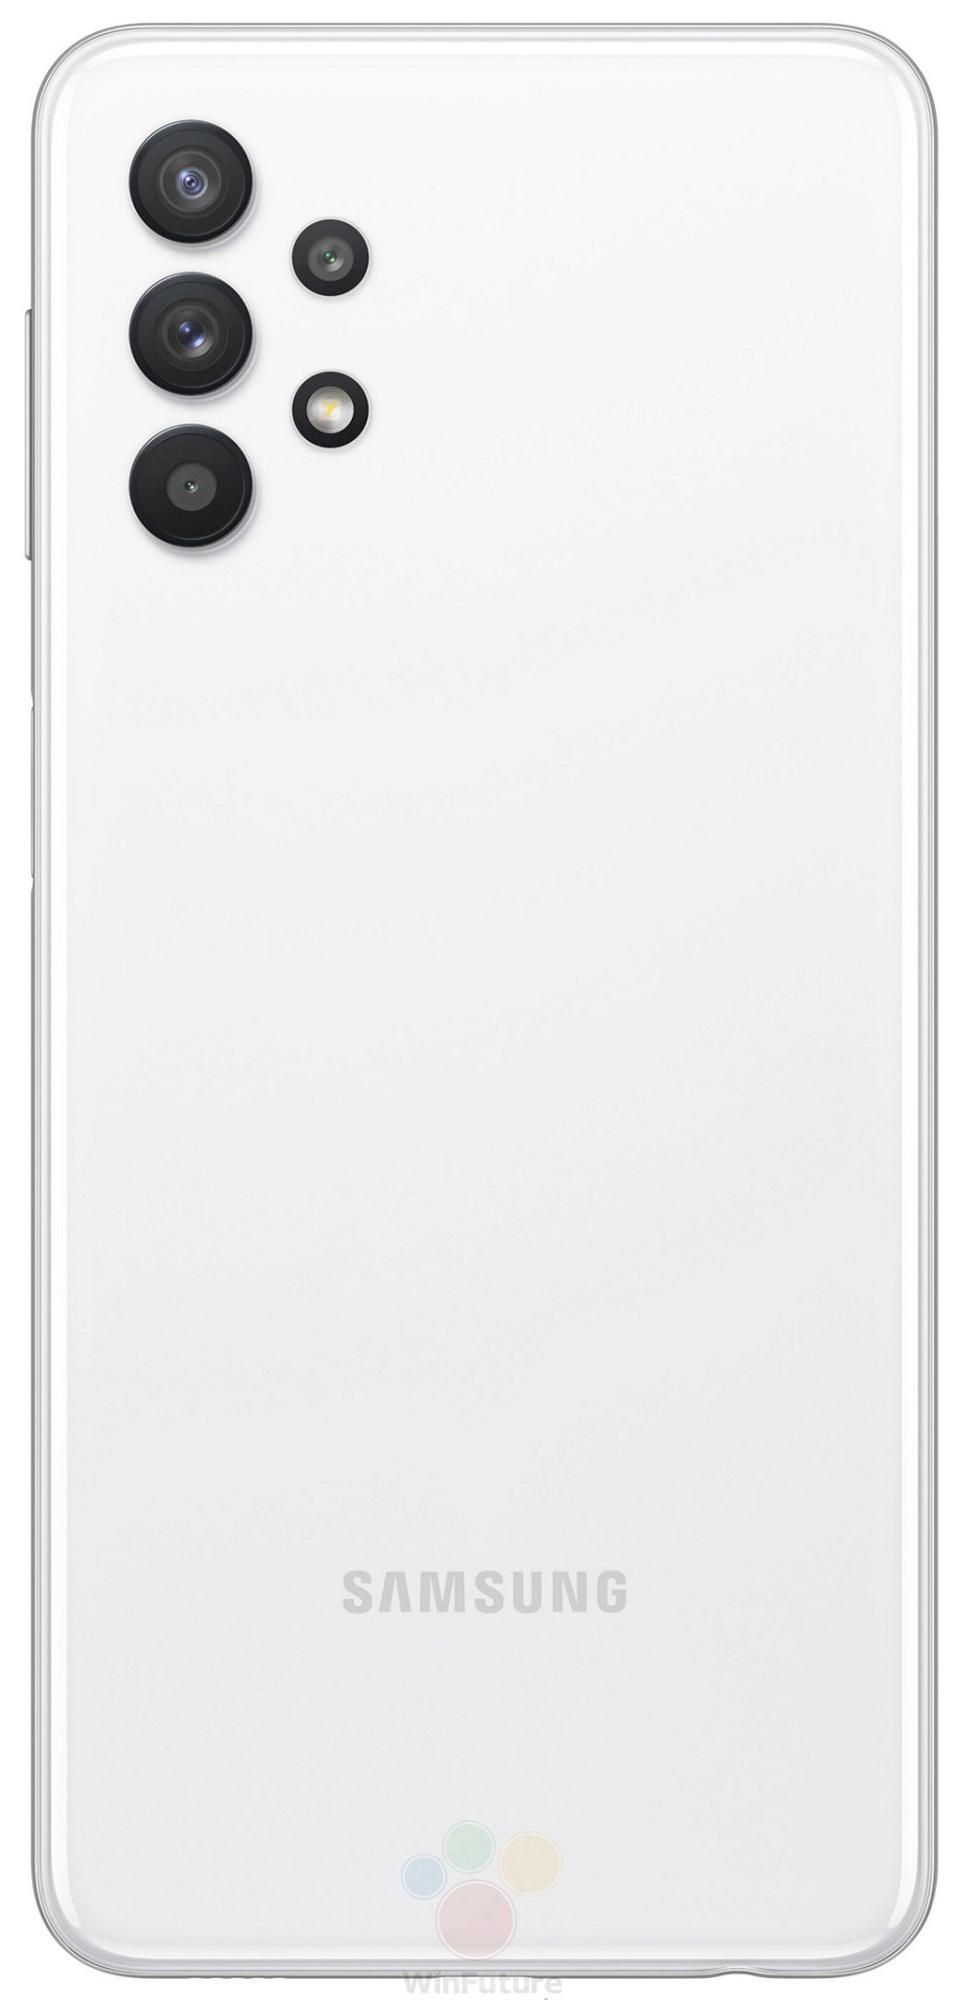 Samsung Galaxy A32: самый доступный смартфон от Samsung с 5G. Фото Samsung  - galaxy_a32_samyj_dostupnyj_samsung_s_5g_bez_bloka_pod_kameru_na_foto_3